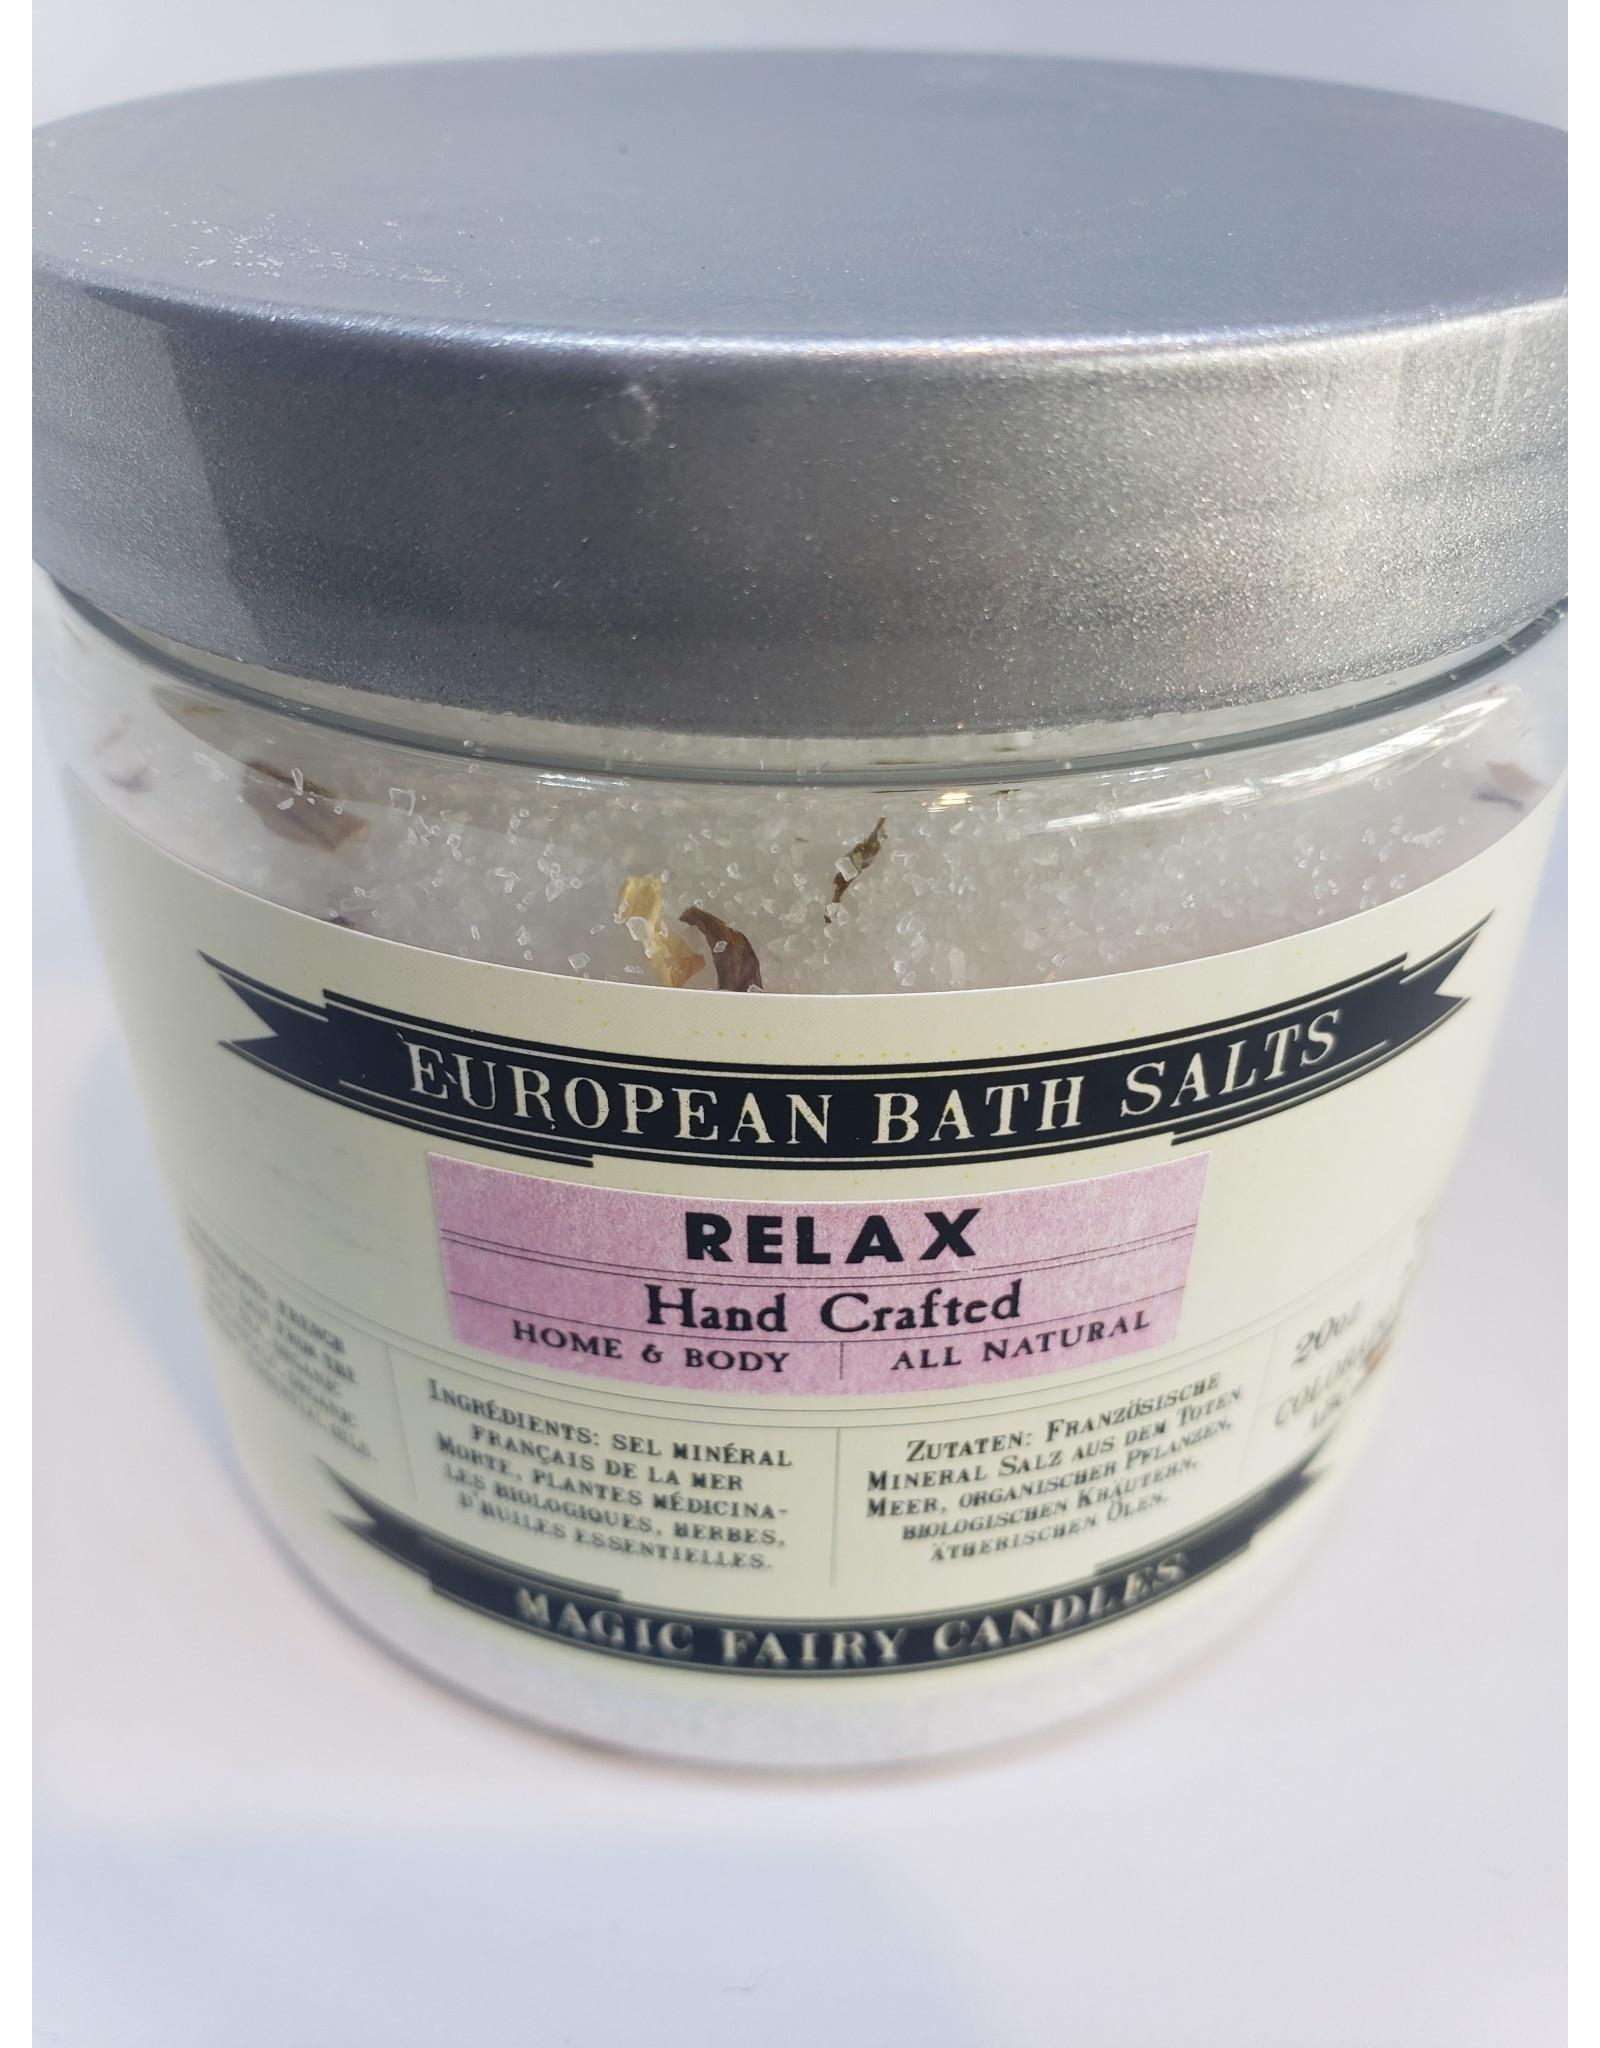 Relax Bath Salt - 16oz